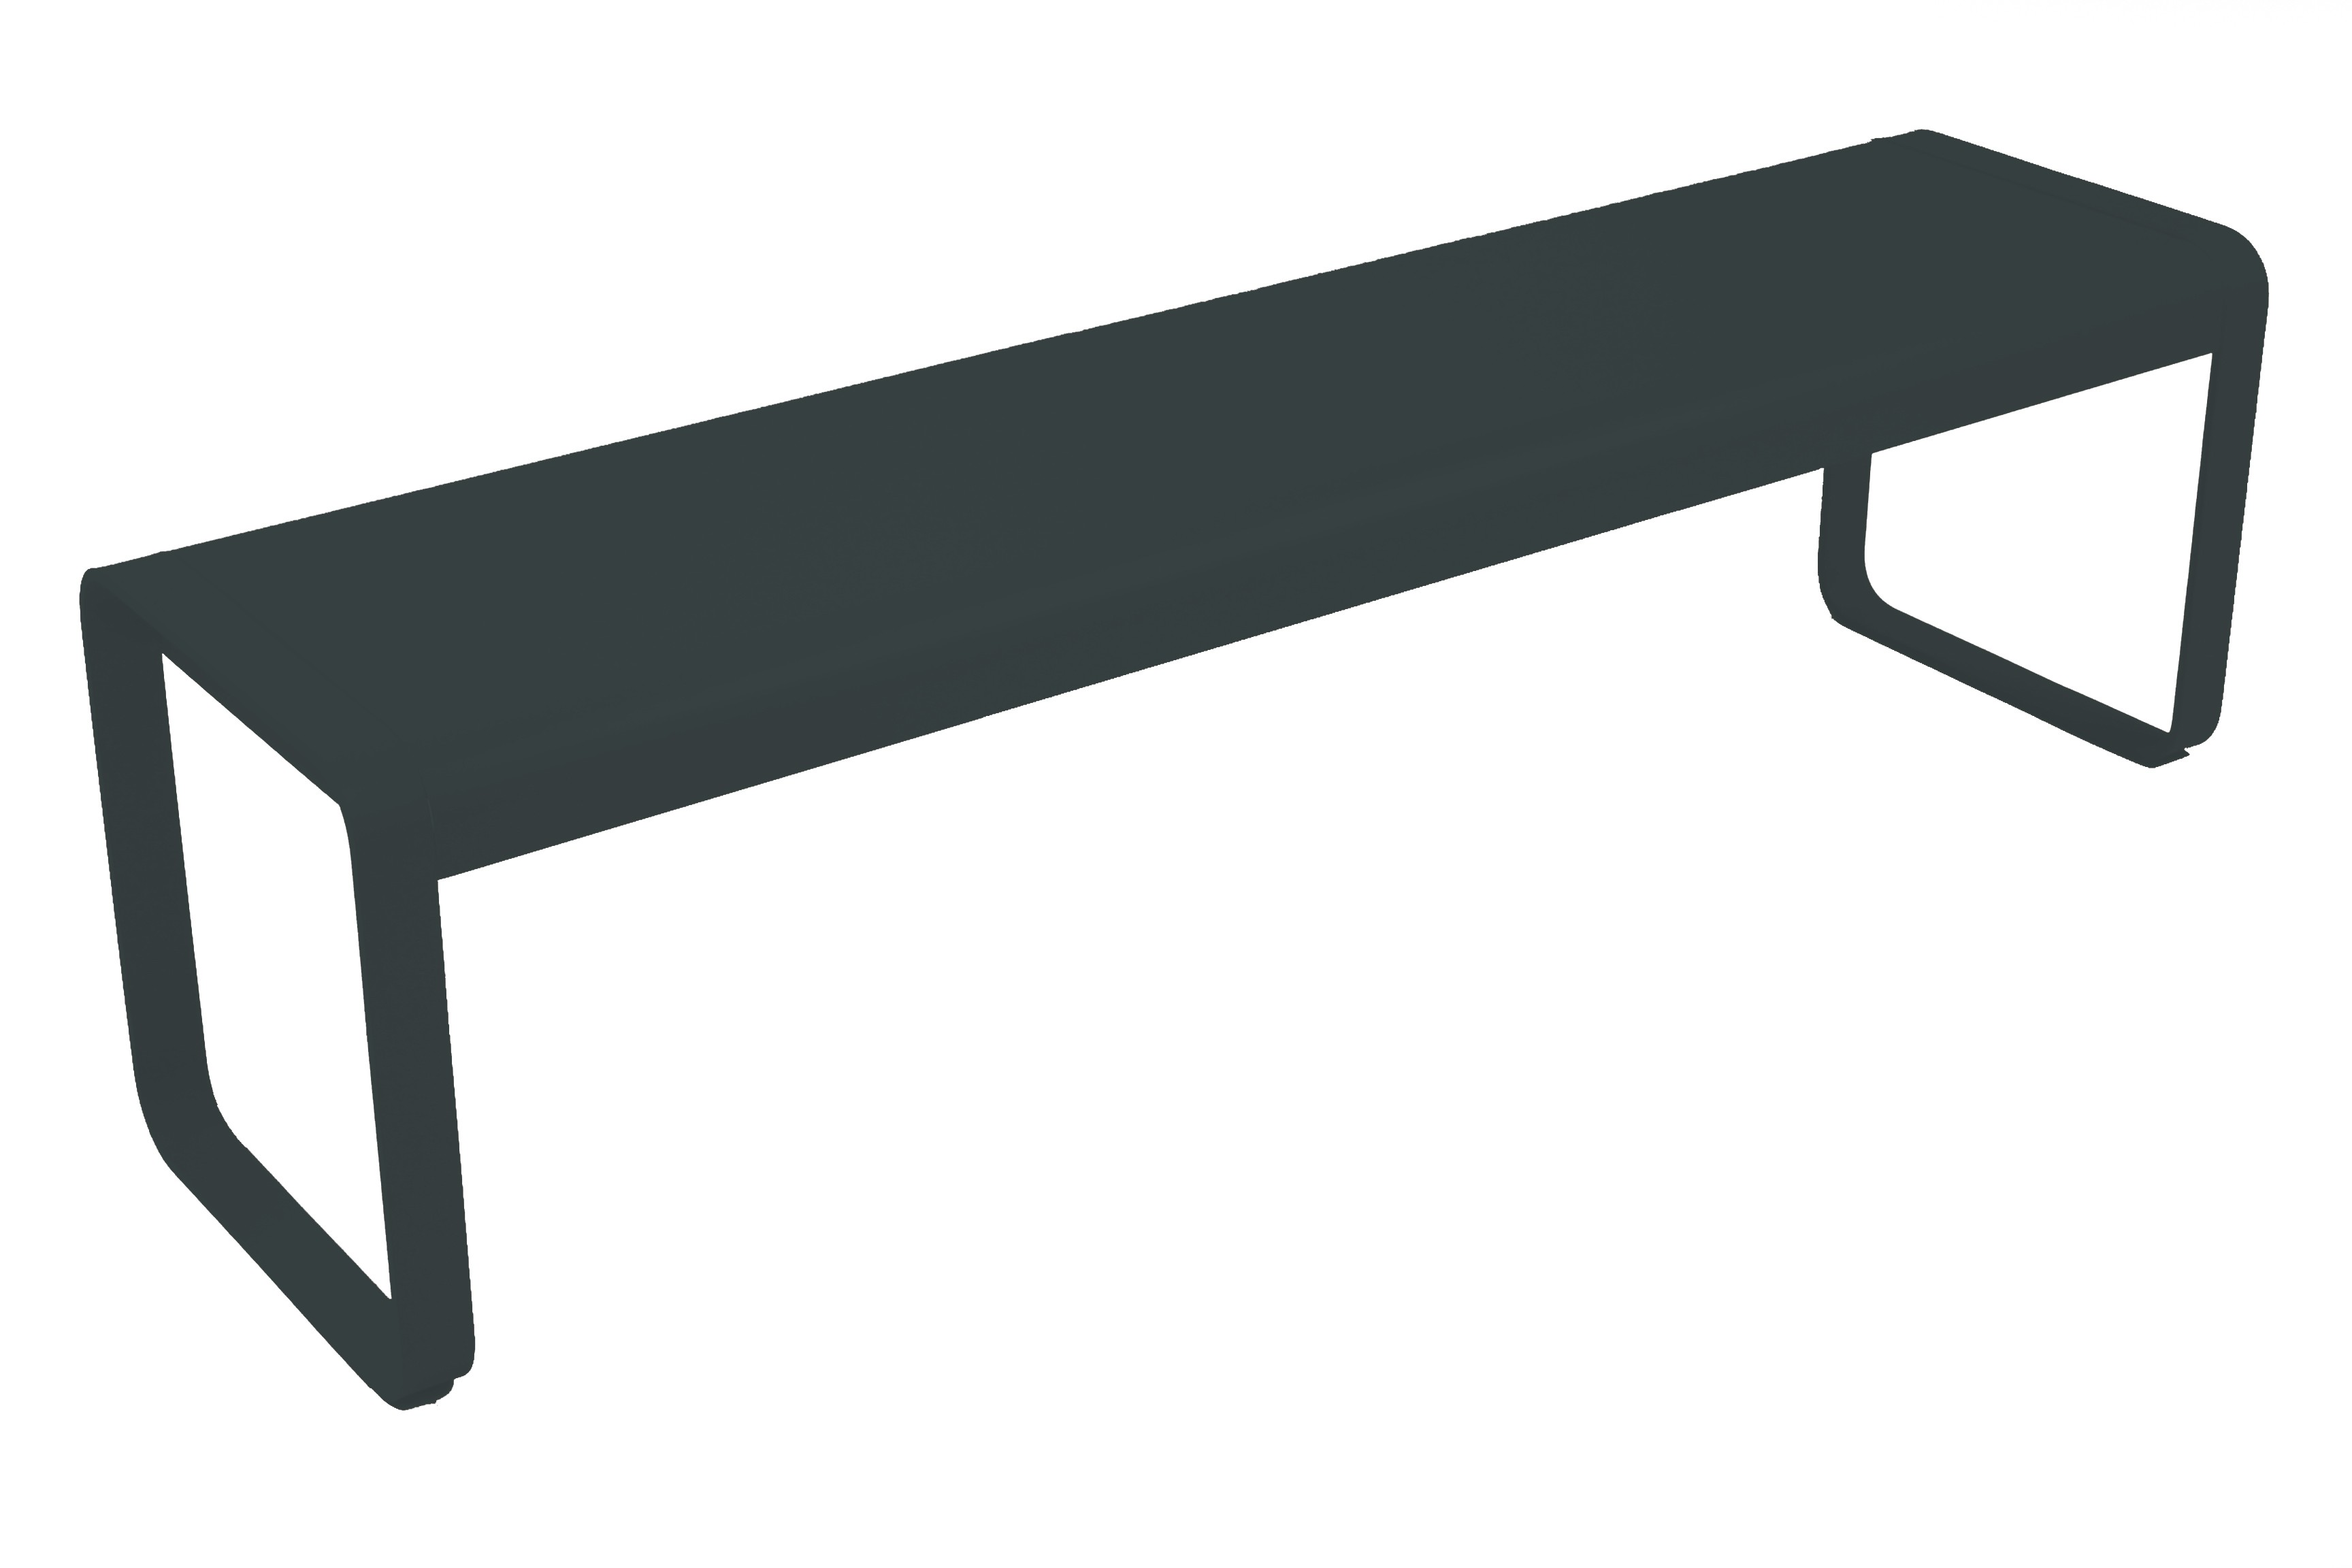 banc bellevie de fermob gris orage. Black Bedroom Furniture Sets. Home Design Ideas